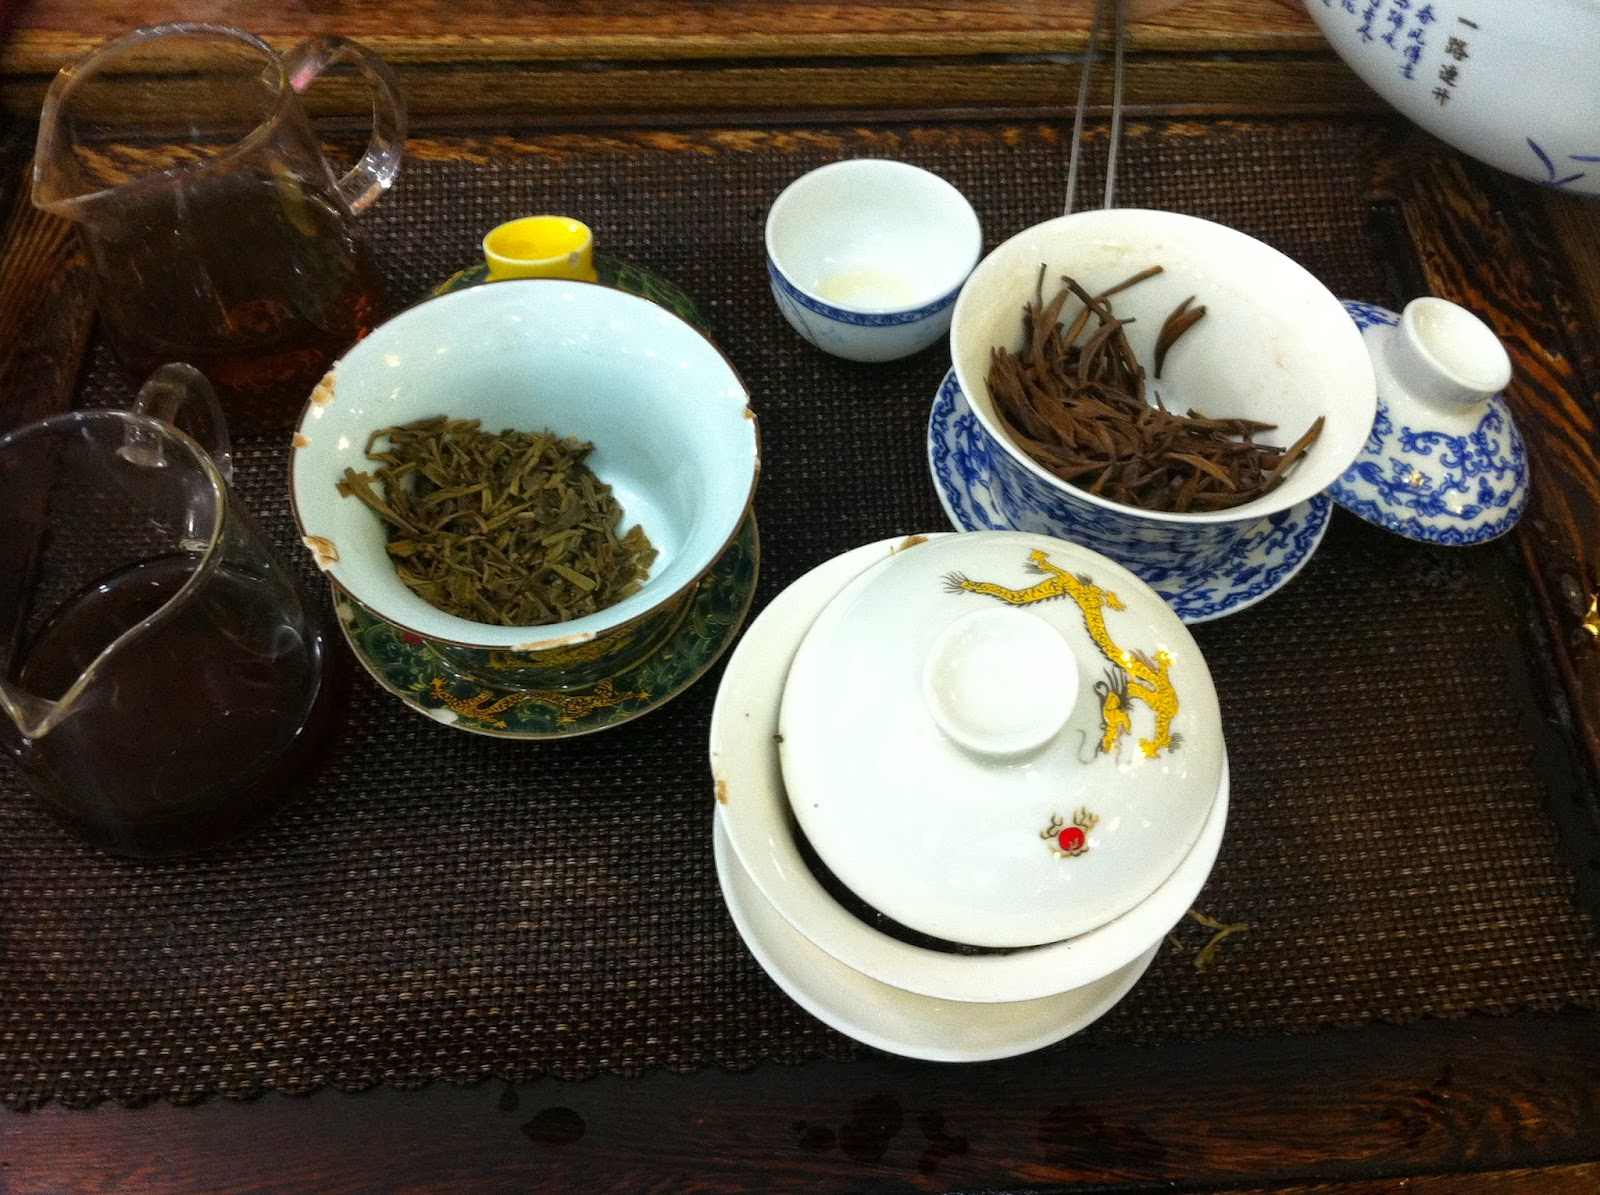 Tea leaves in tea pots for a tea tasting